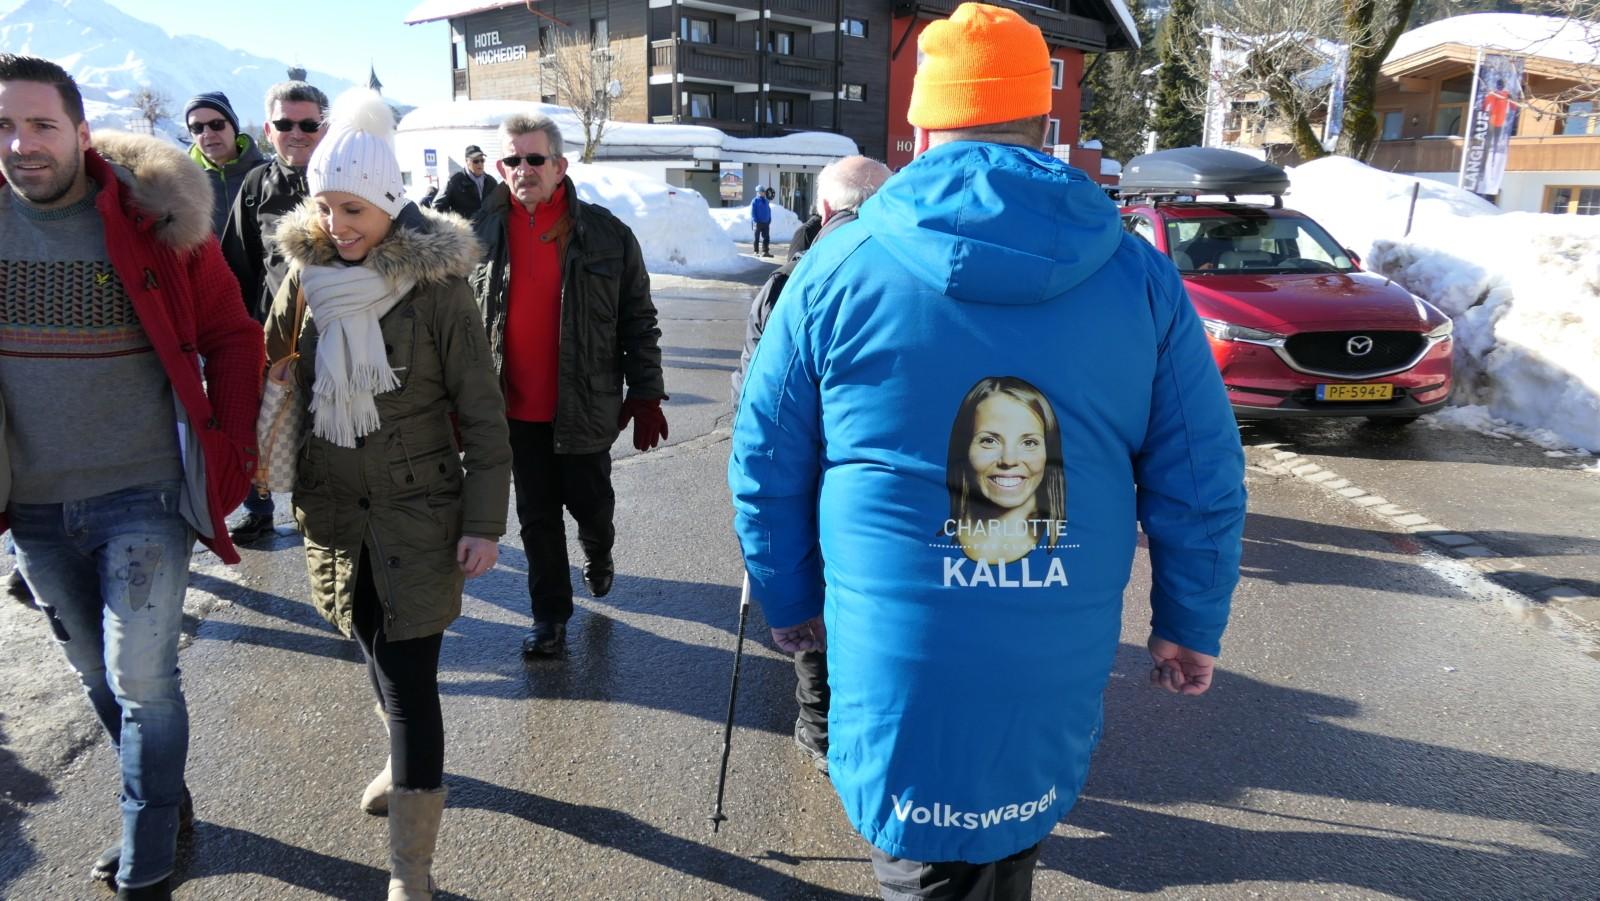 Charlotte Kalla's Victory Secret: Famous Blue Jackets From Tärendö